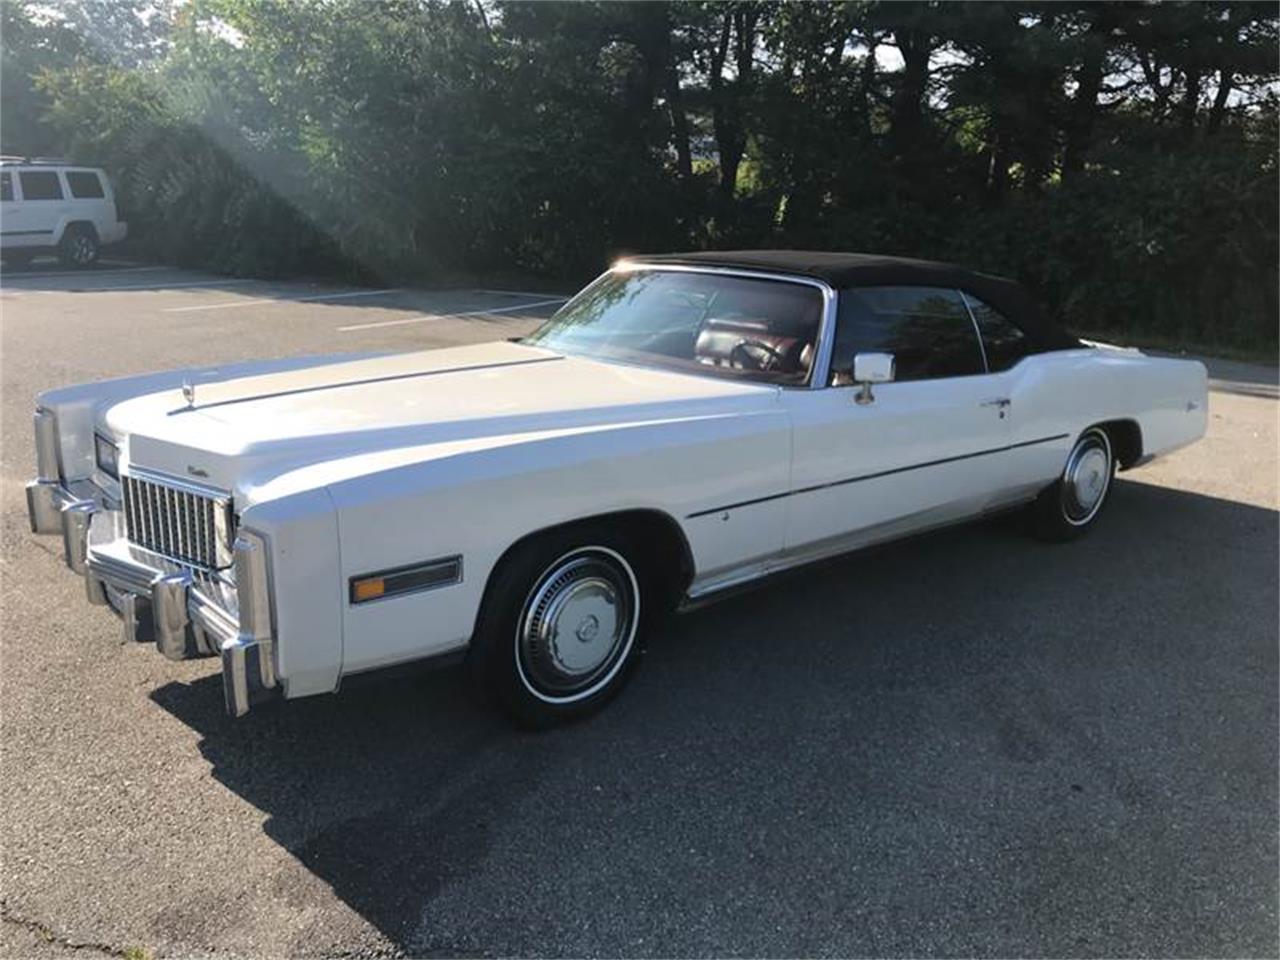 1976 Cadillac Eldorado (CC-1248134) for sale in Westford, Massachusetts